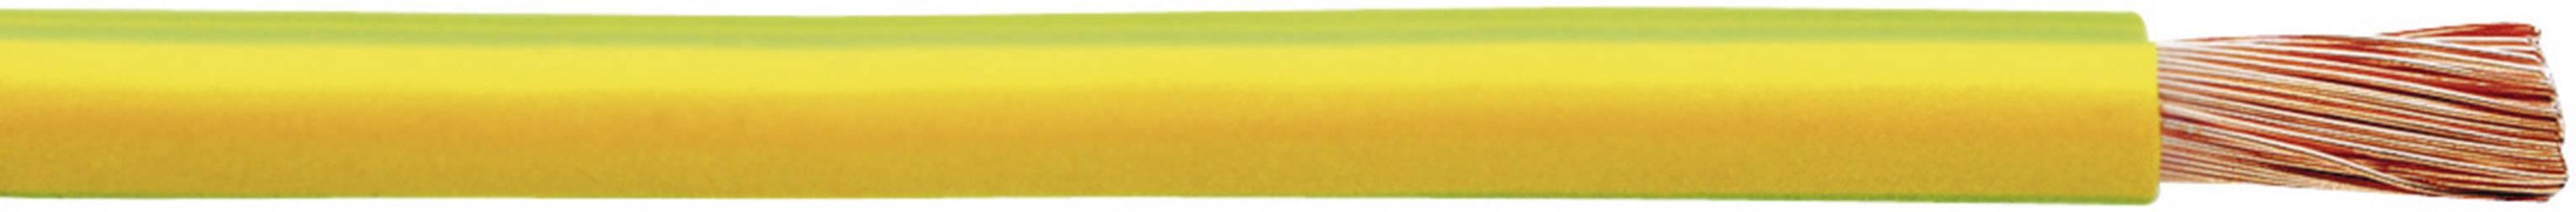 Pletenica H07V-K 1 x 2.50 mm, zelena-rumena Faber Kabel 040054 100 m